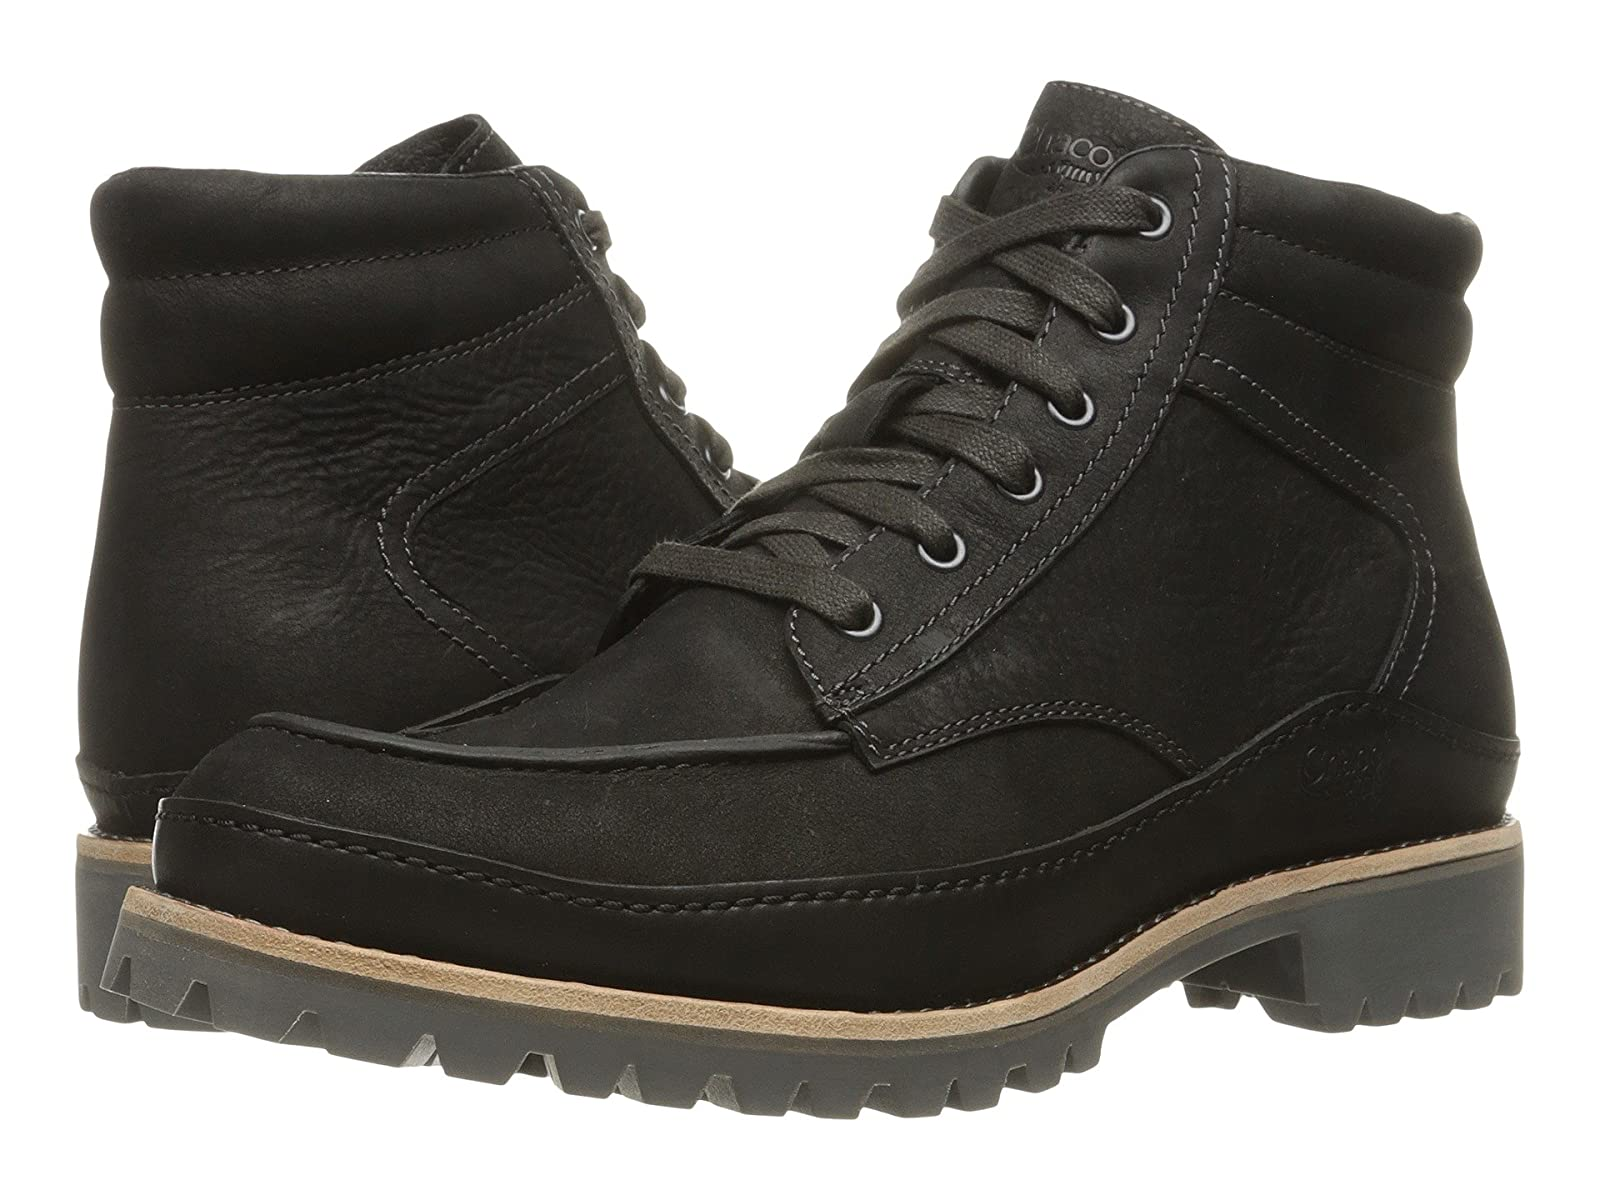 Chaco YonderCheap and distinctive eye-catching shoes